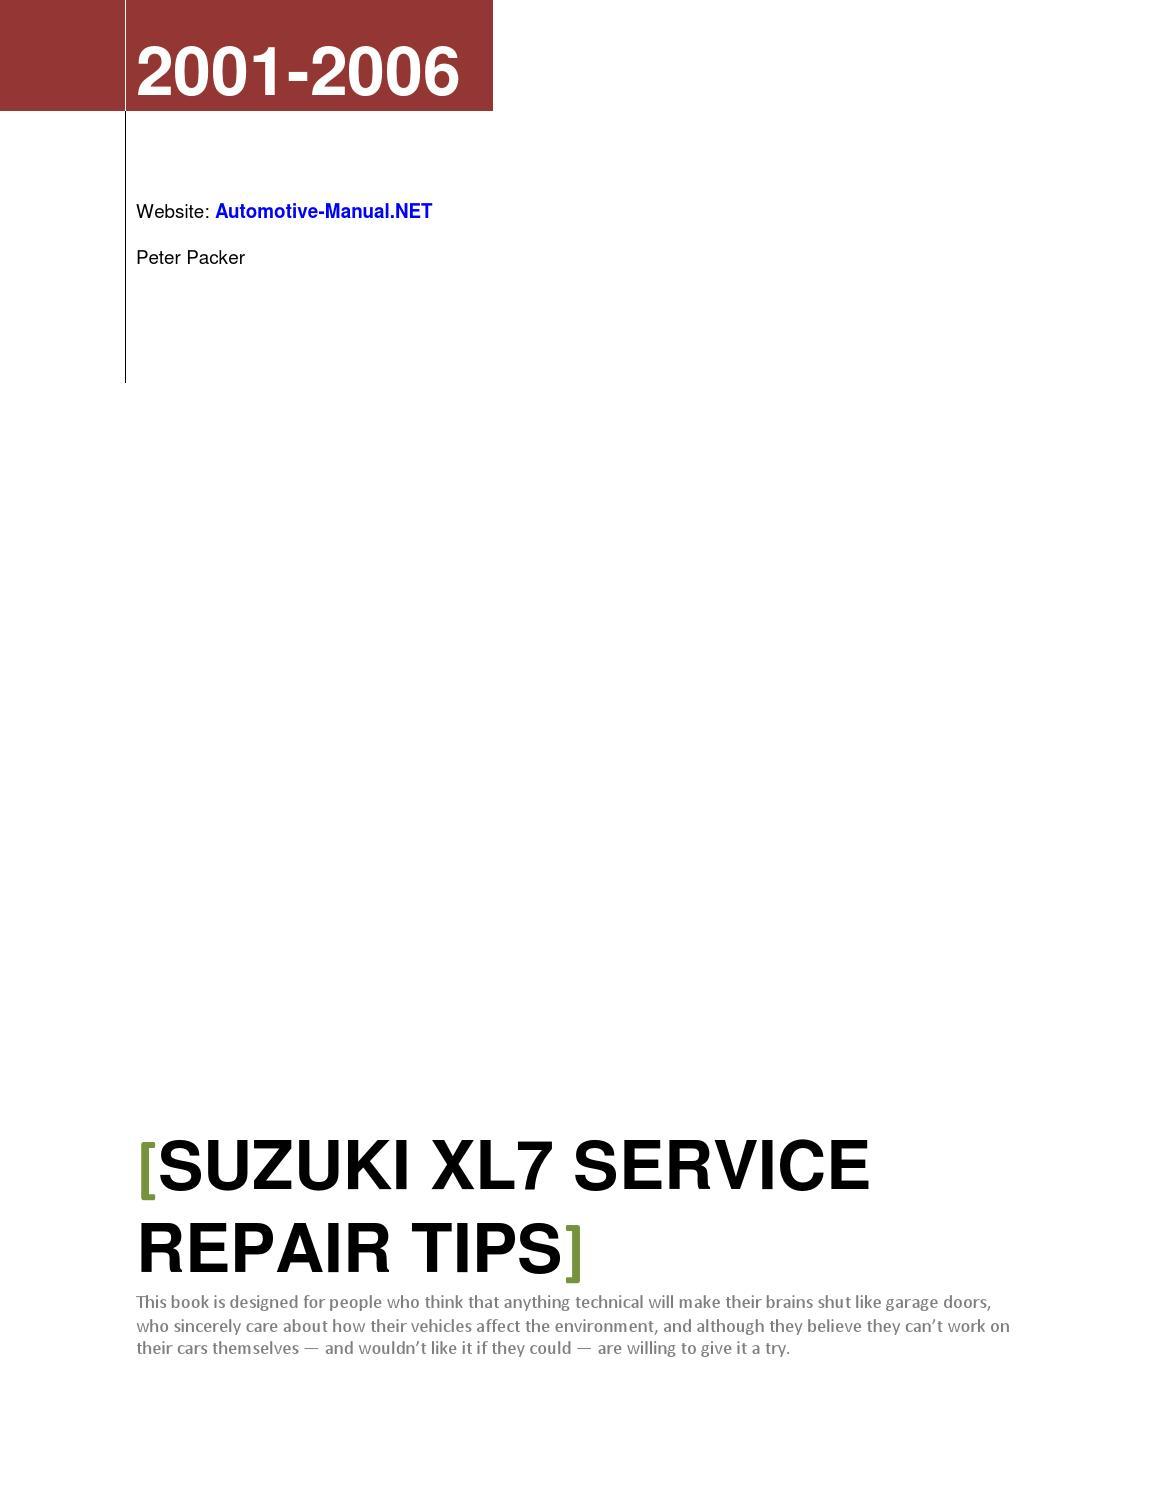 Suzuki XL7 2001-2006 Service Repair Tips by Armando Oliver